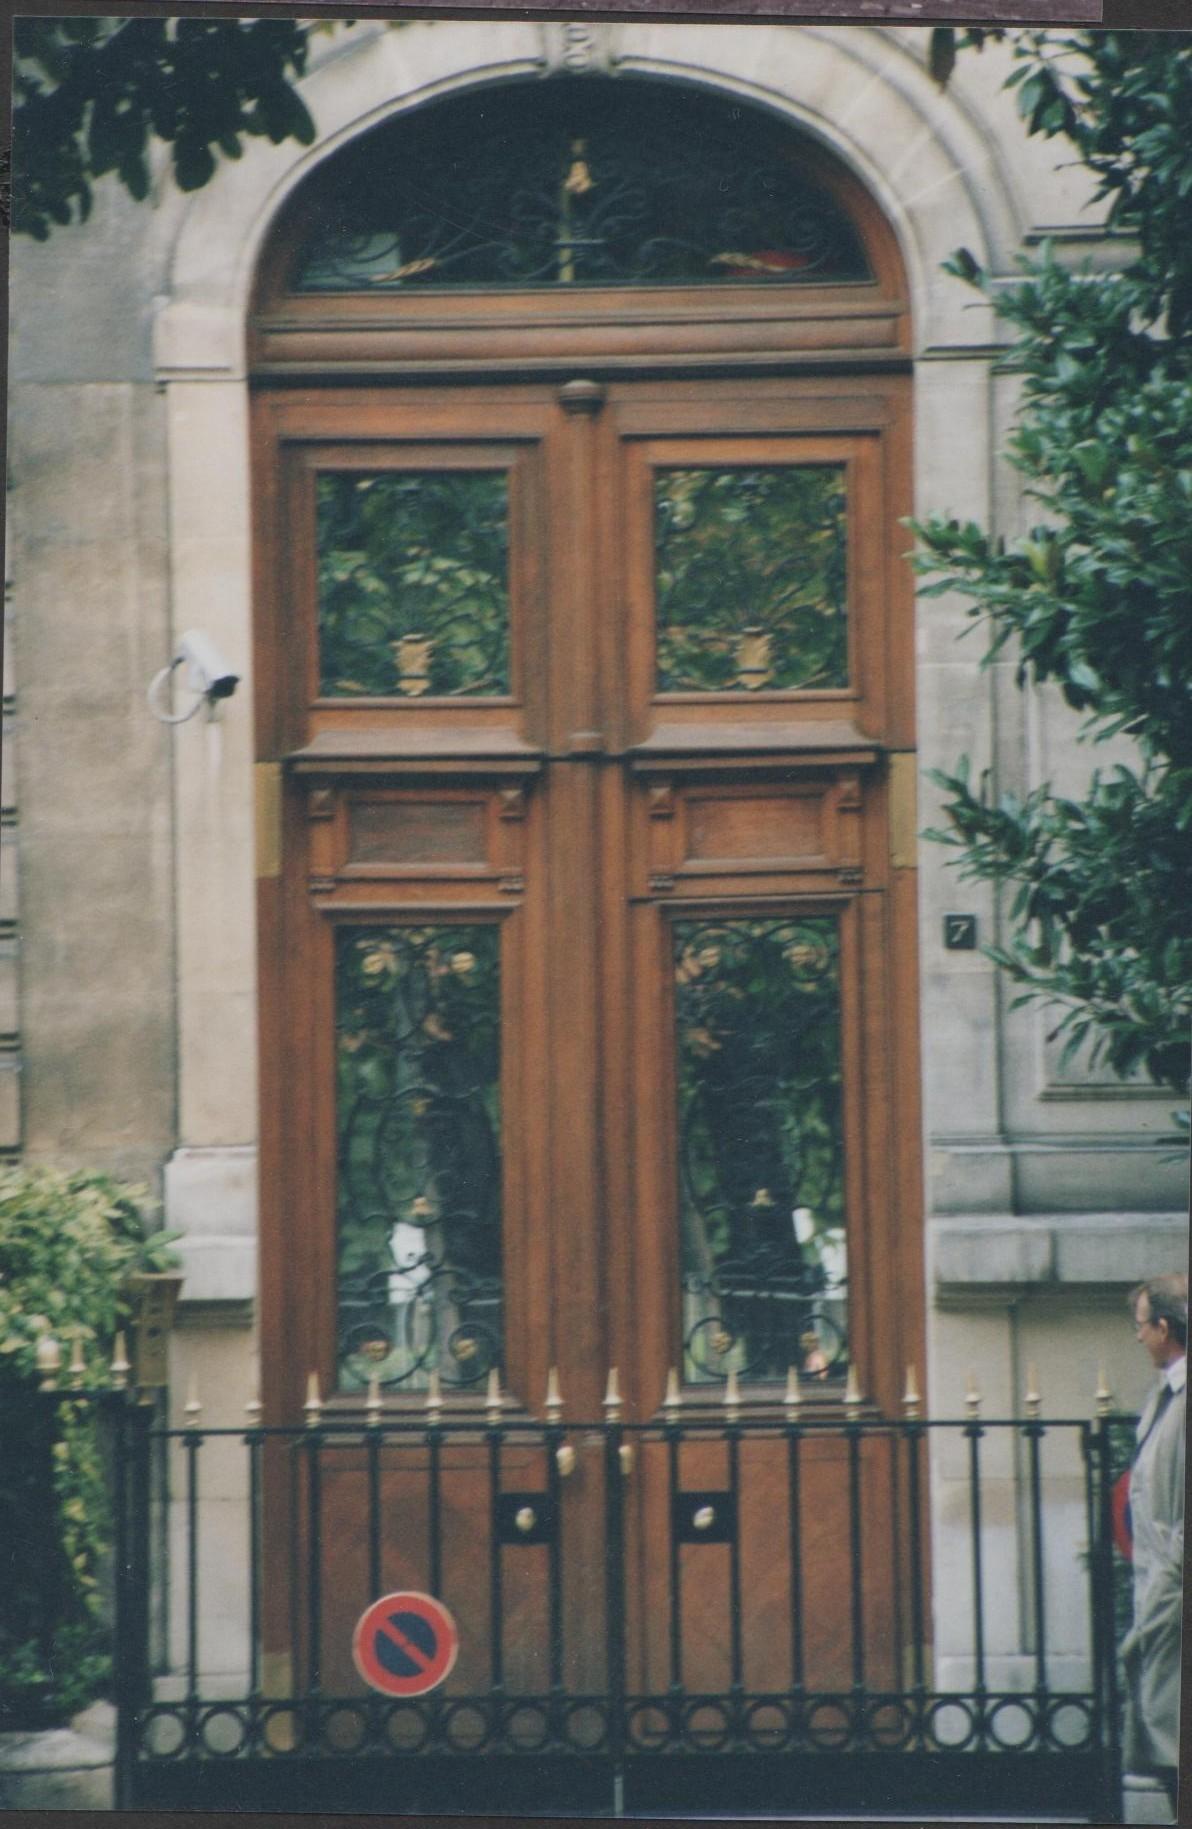 paris door, paris architecture, france